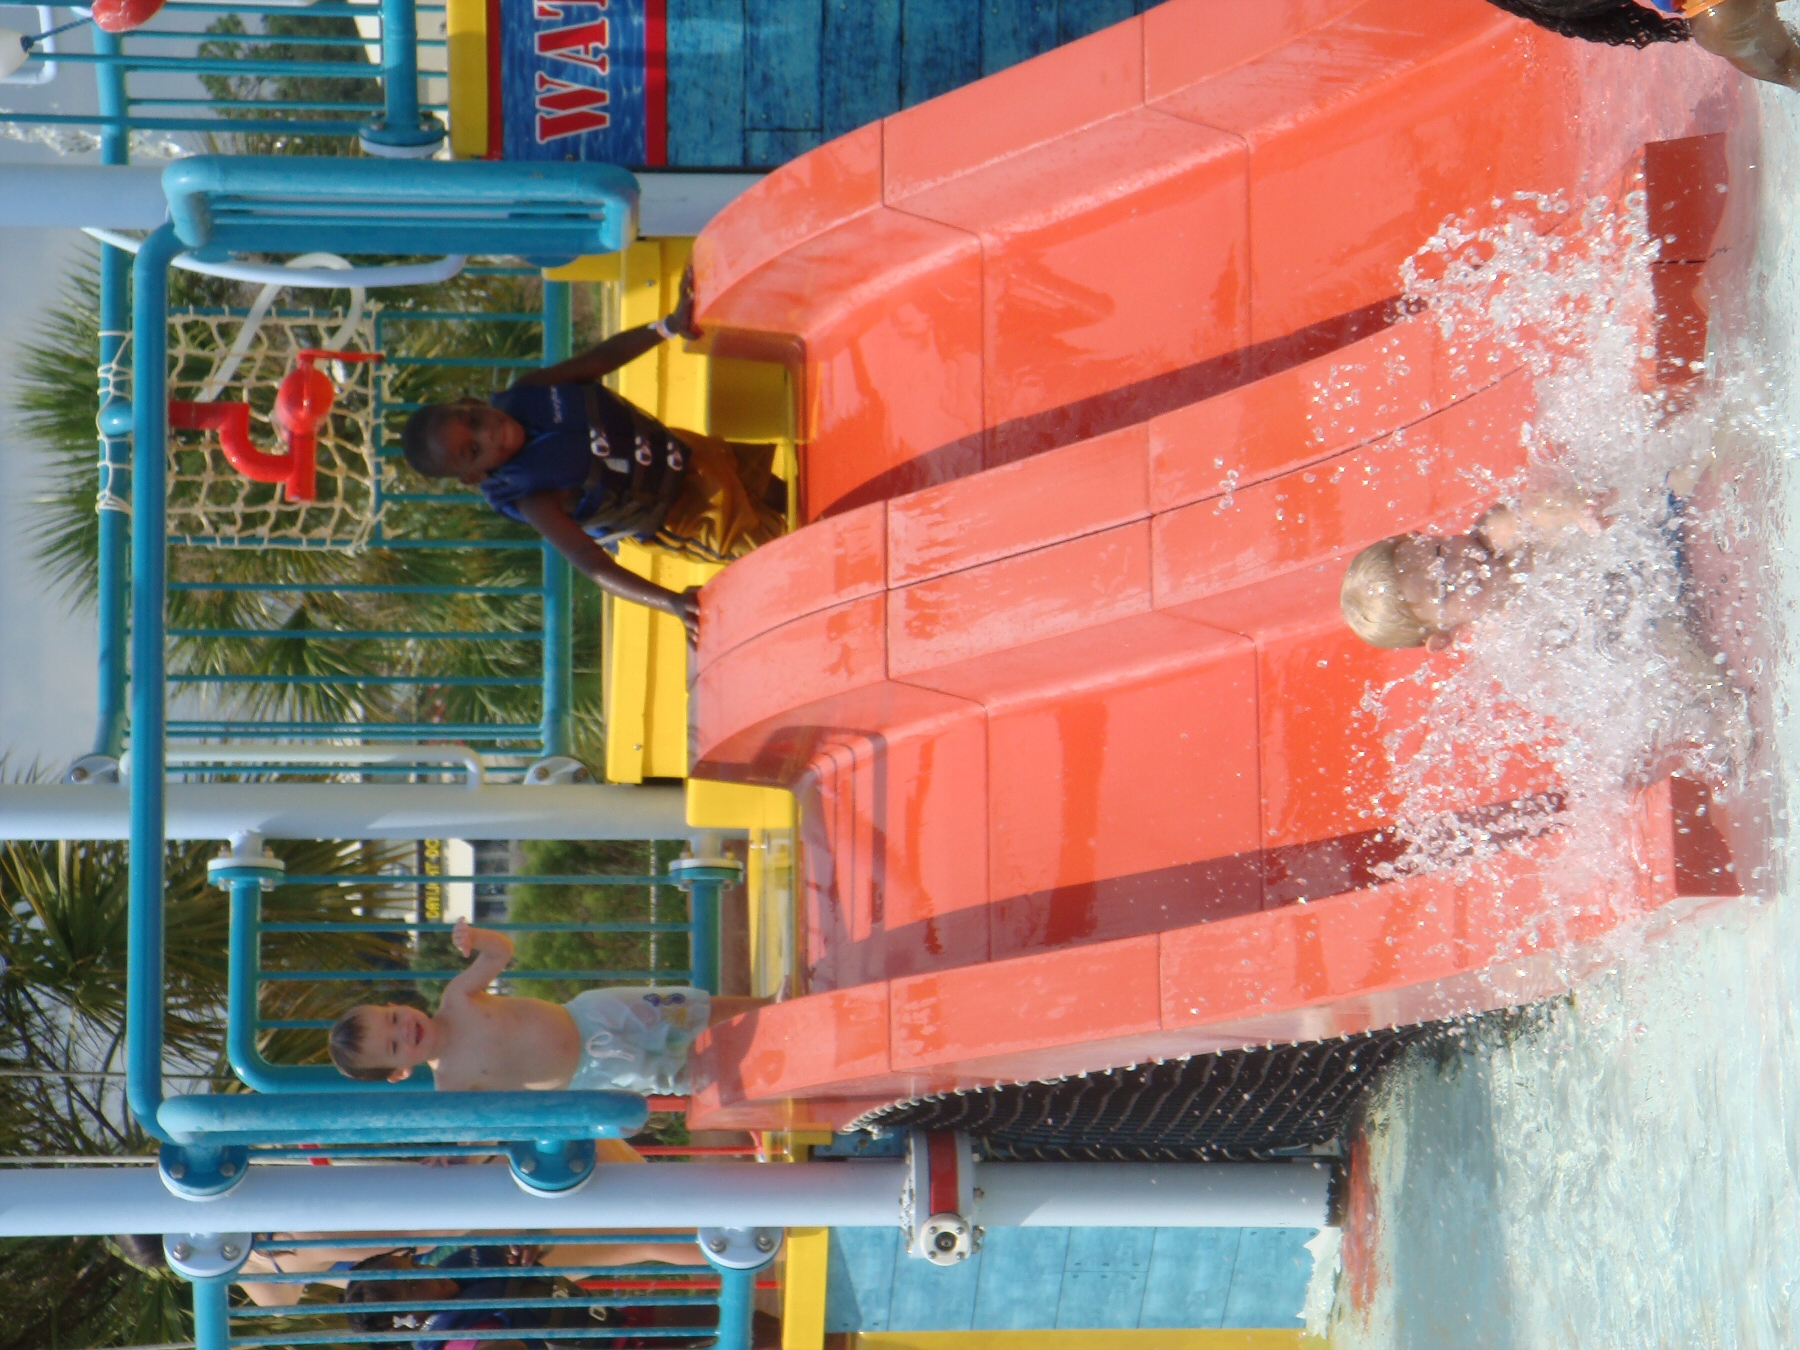 kids going down water slide